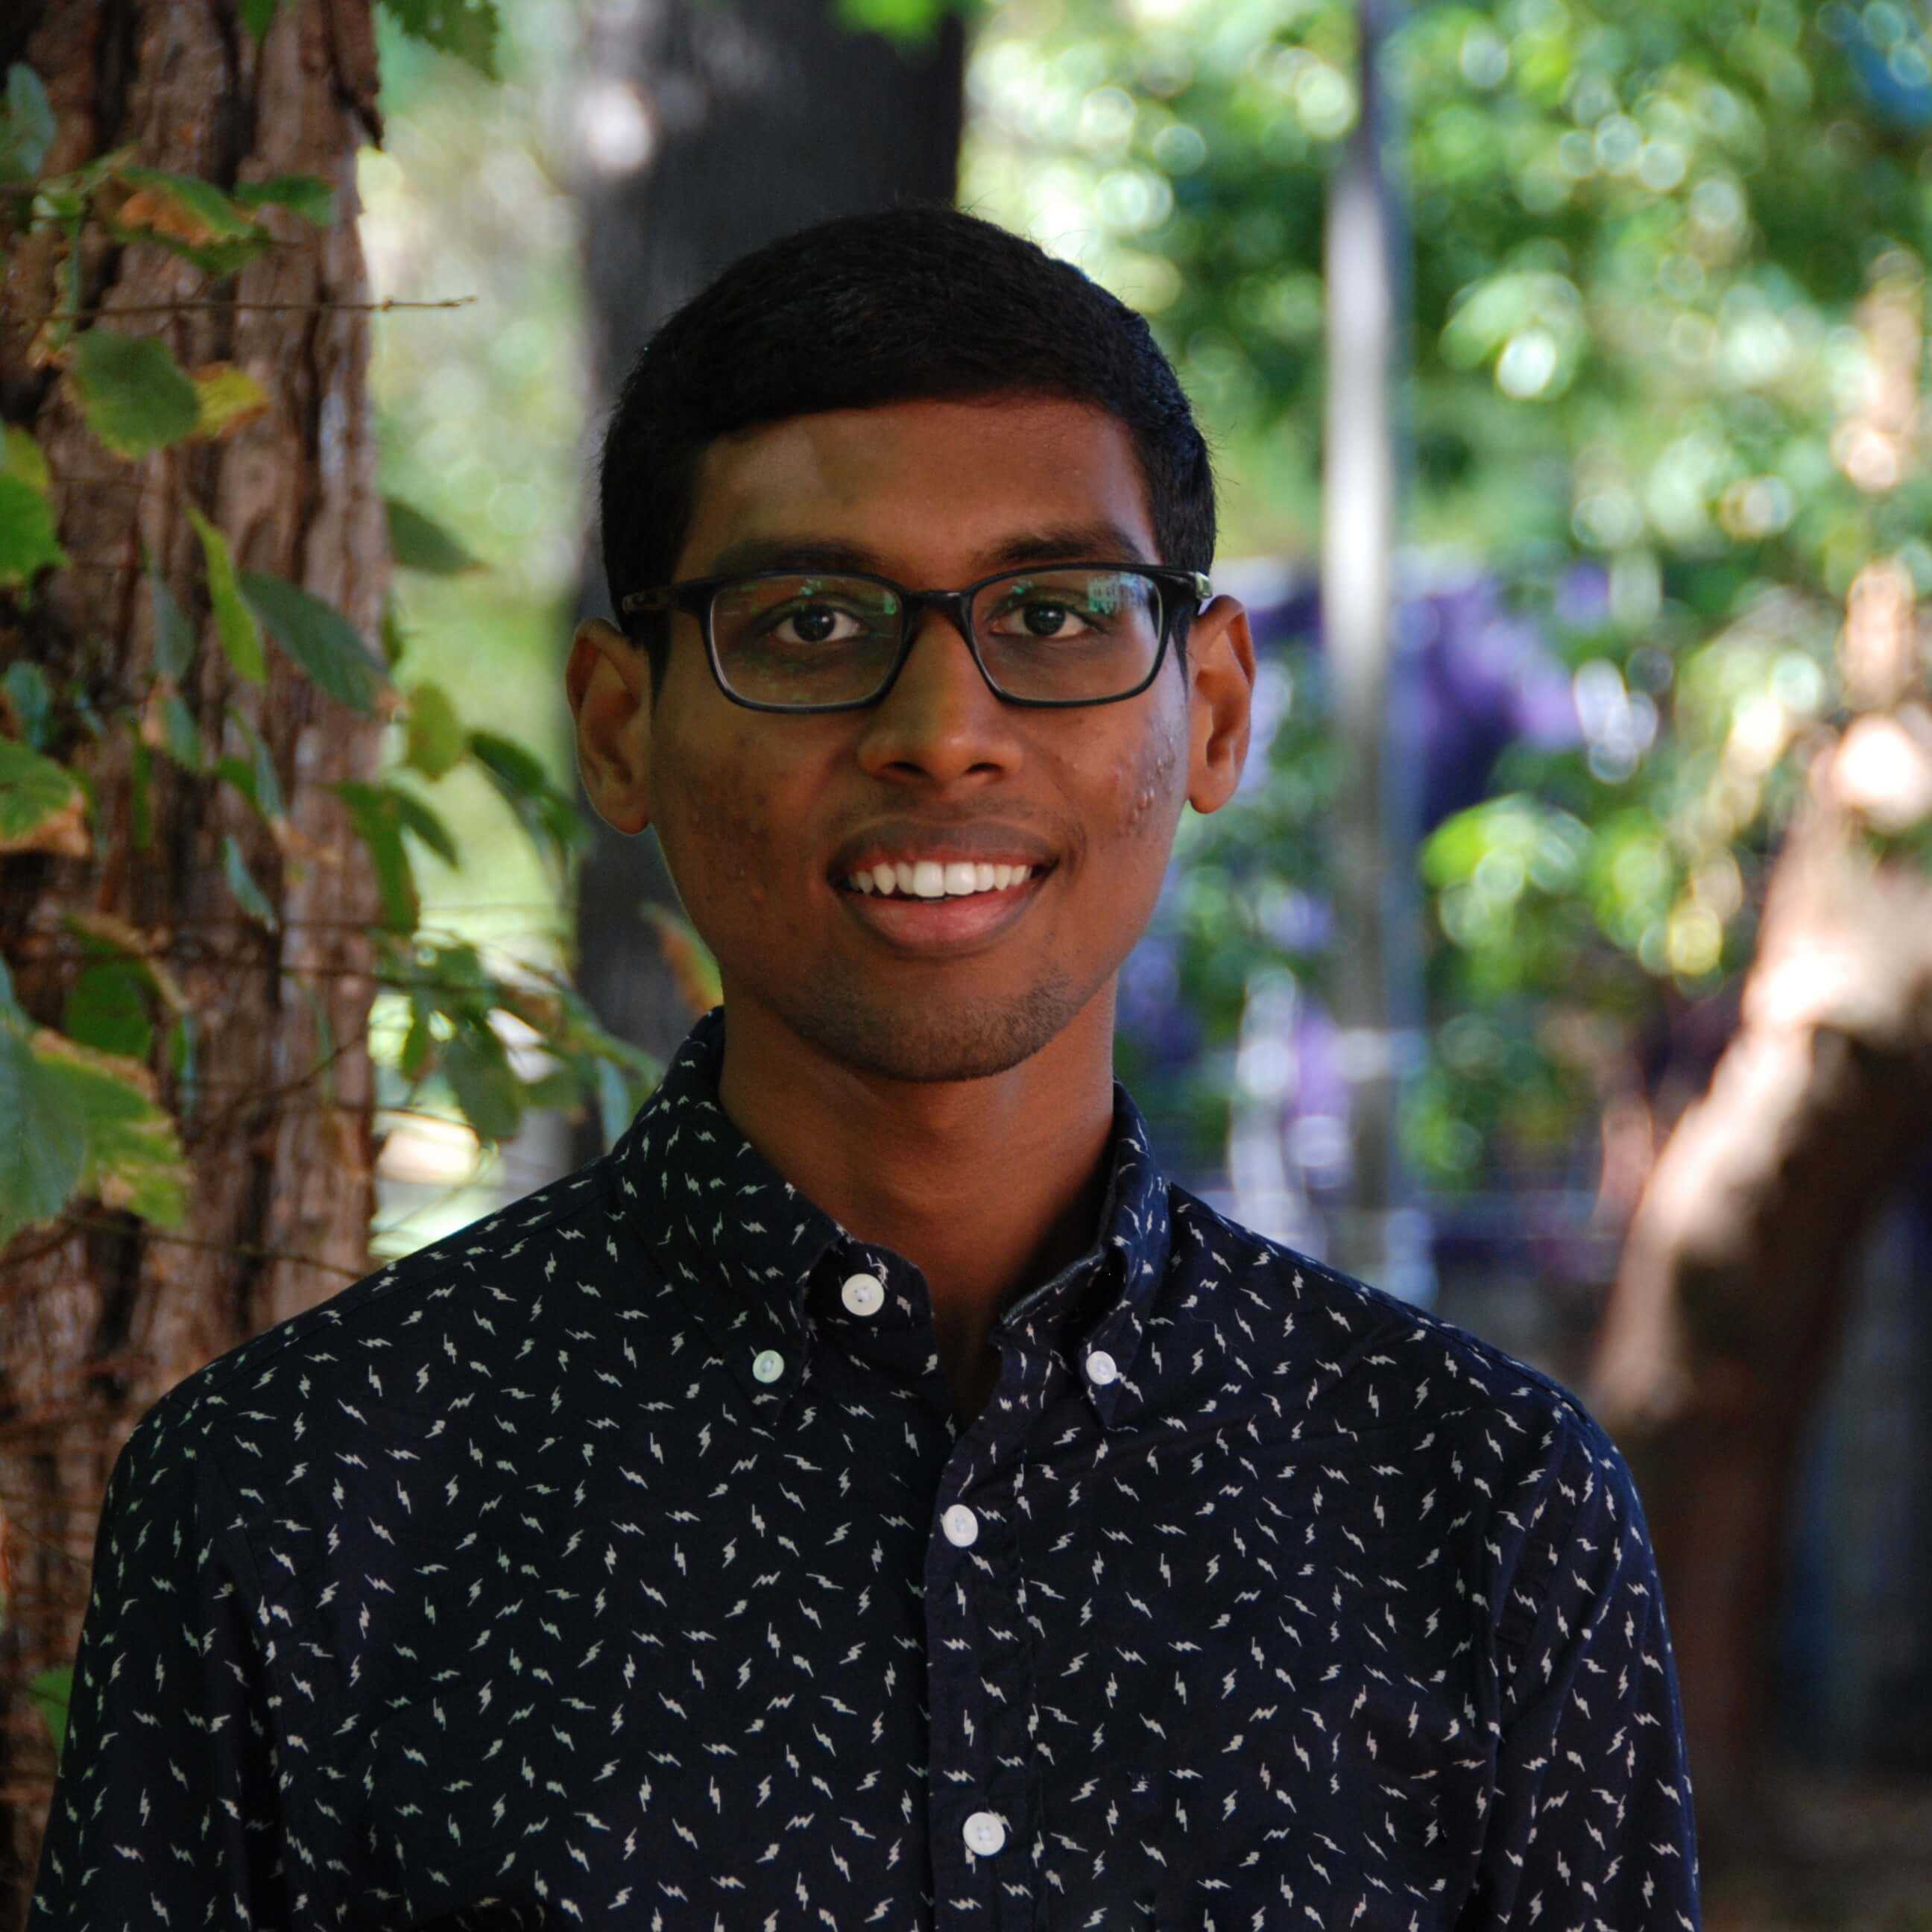 Sritam Kethireddy : Graduate Student